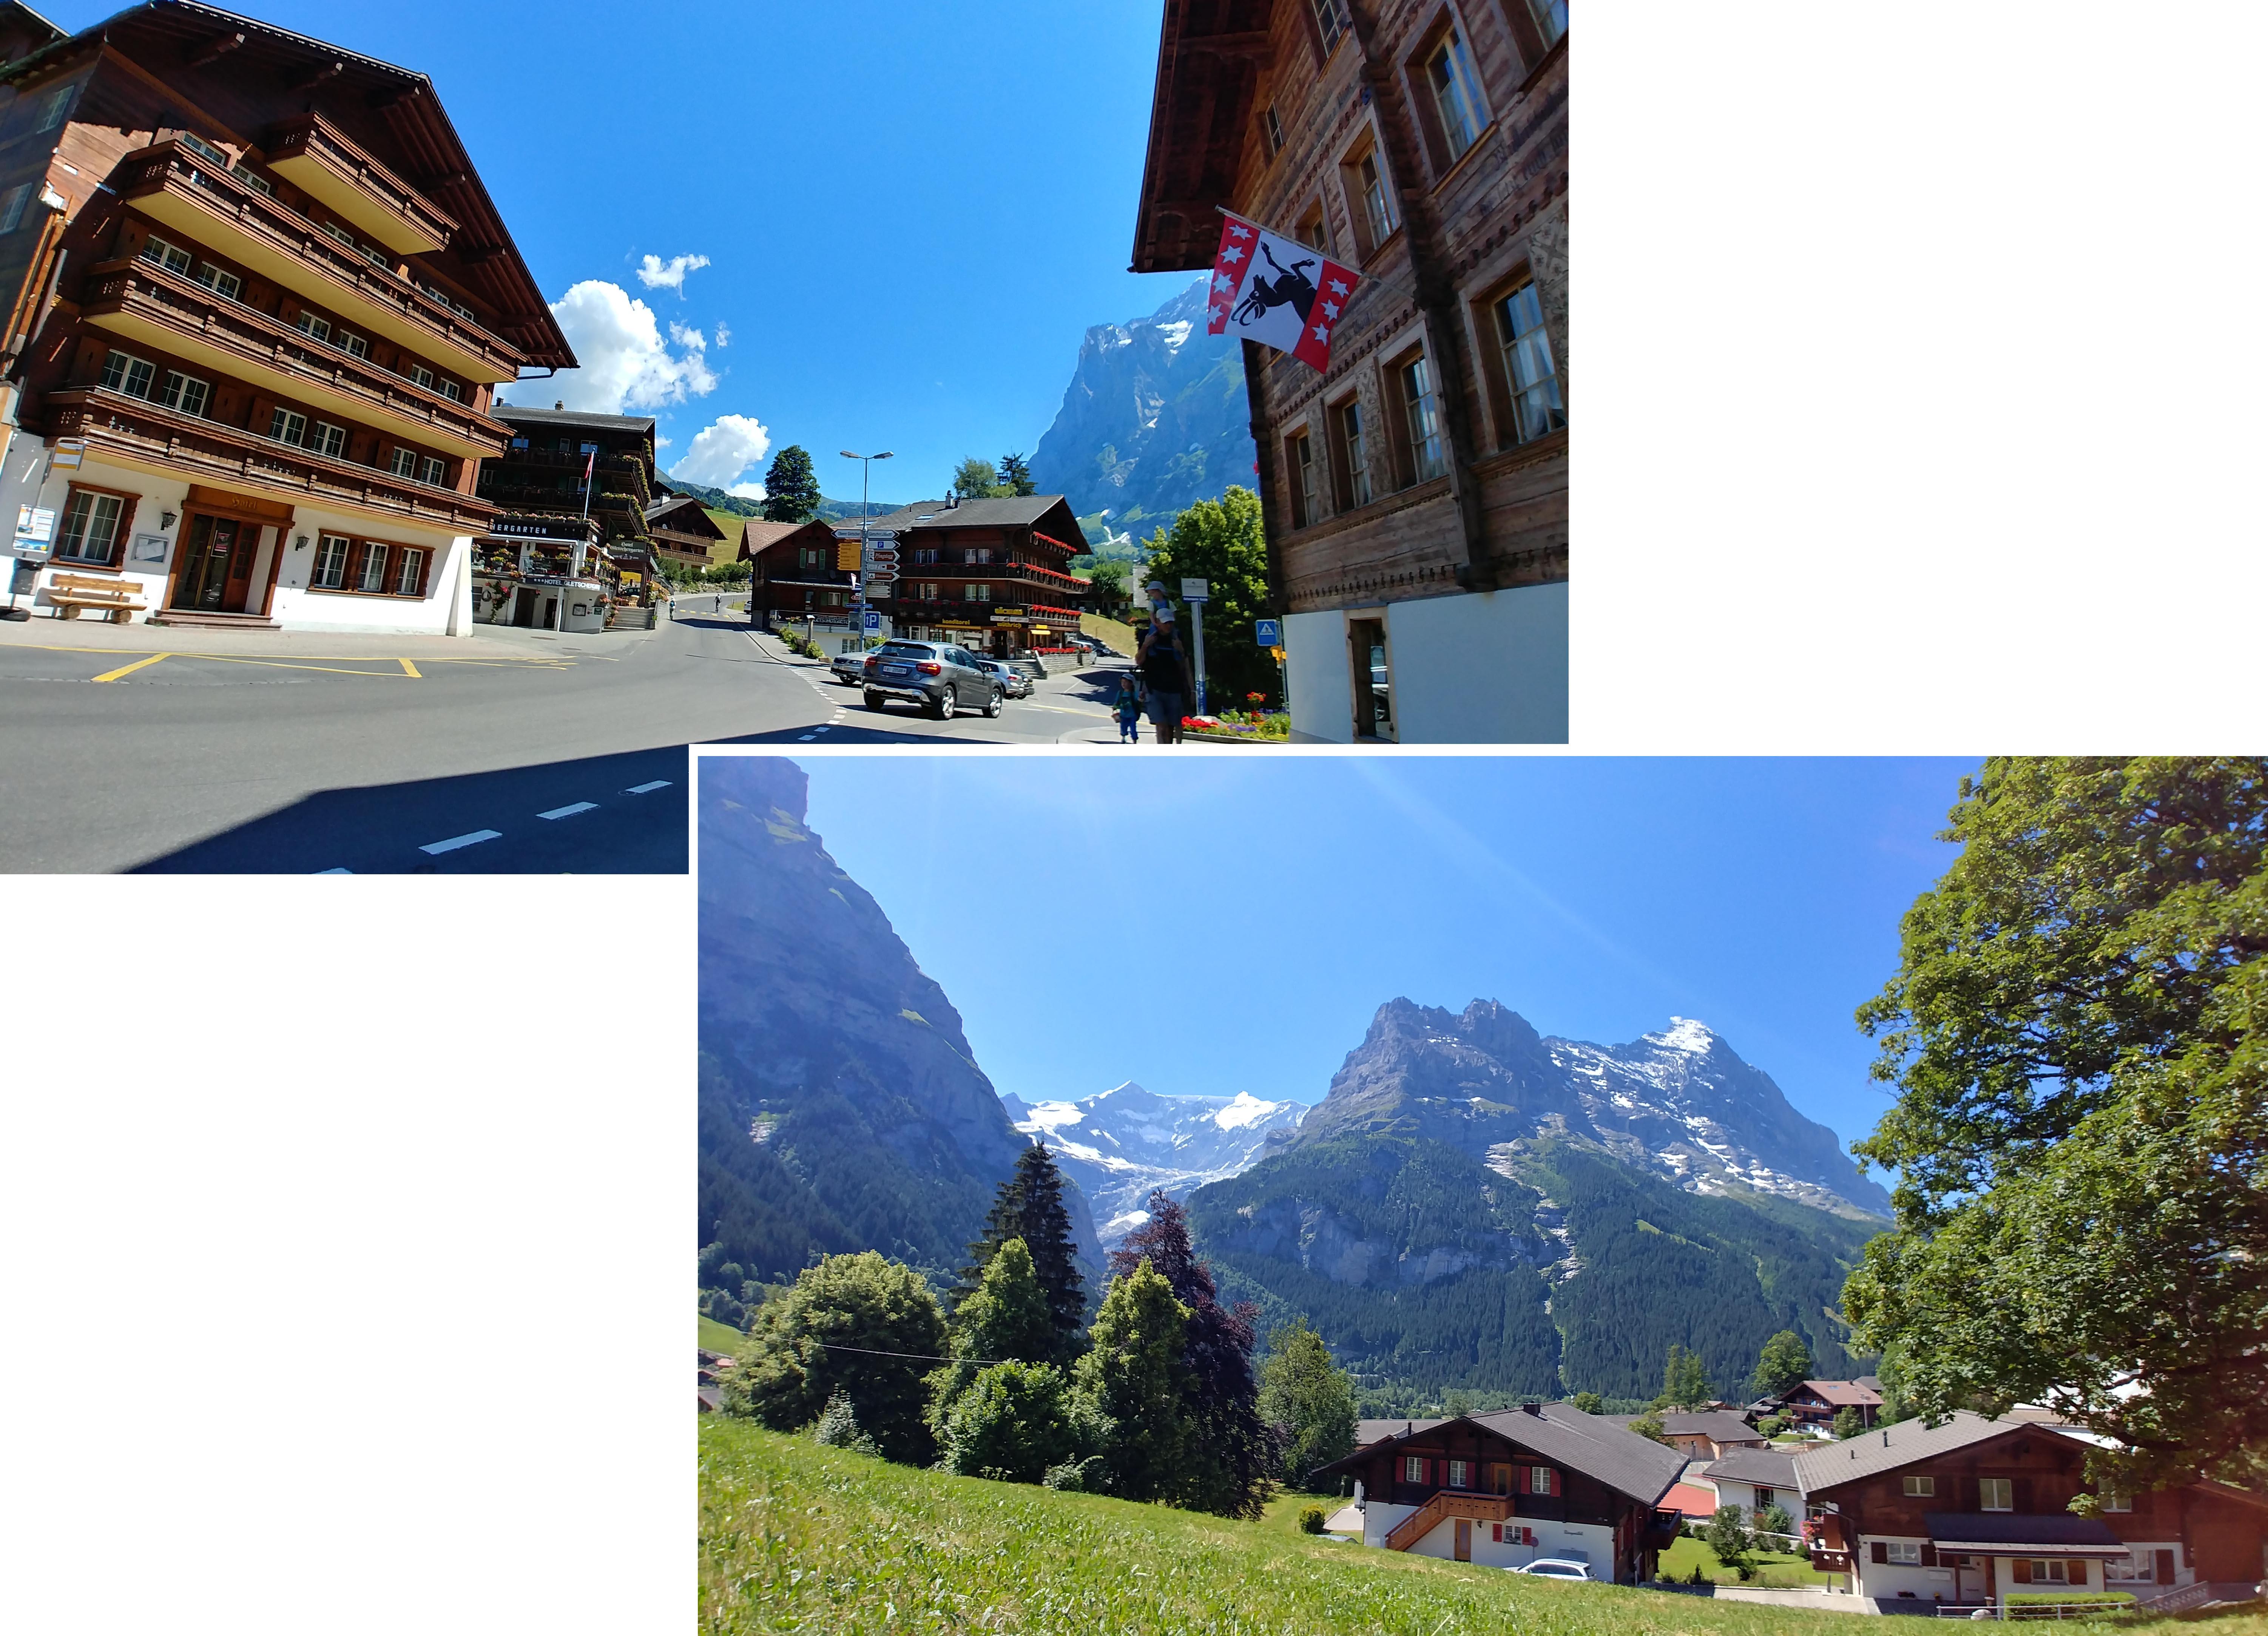 Grindelwald town